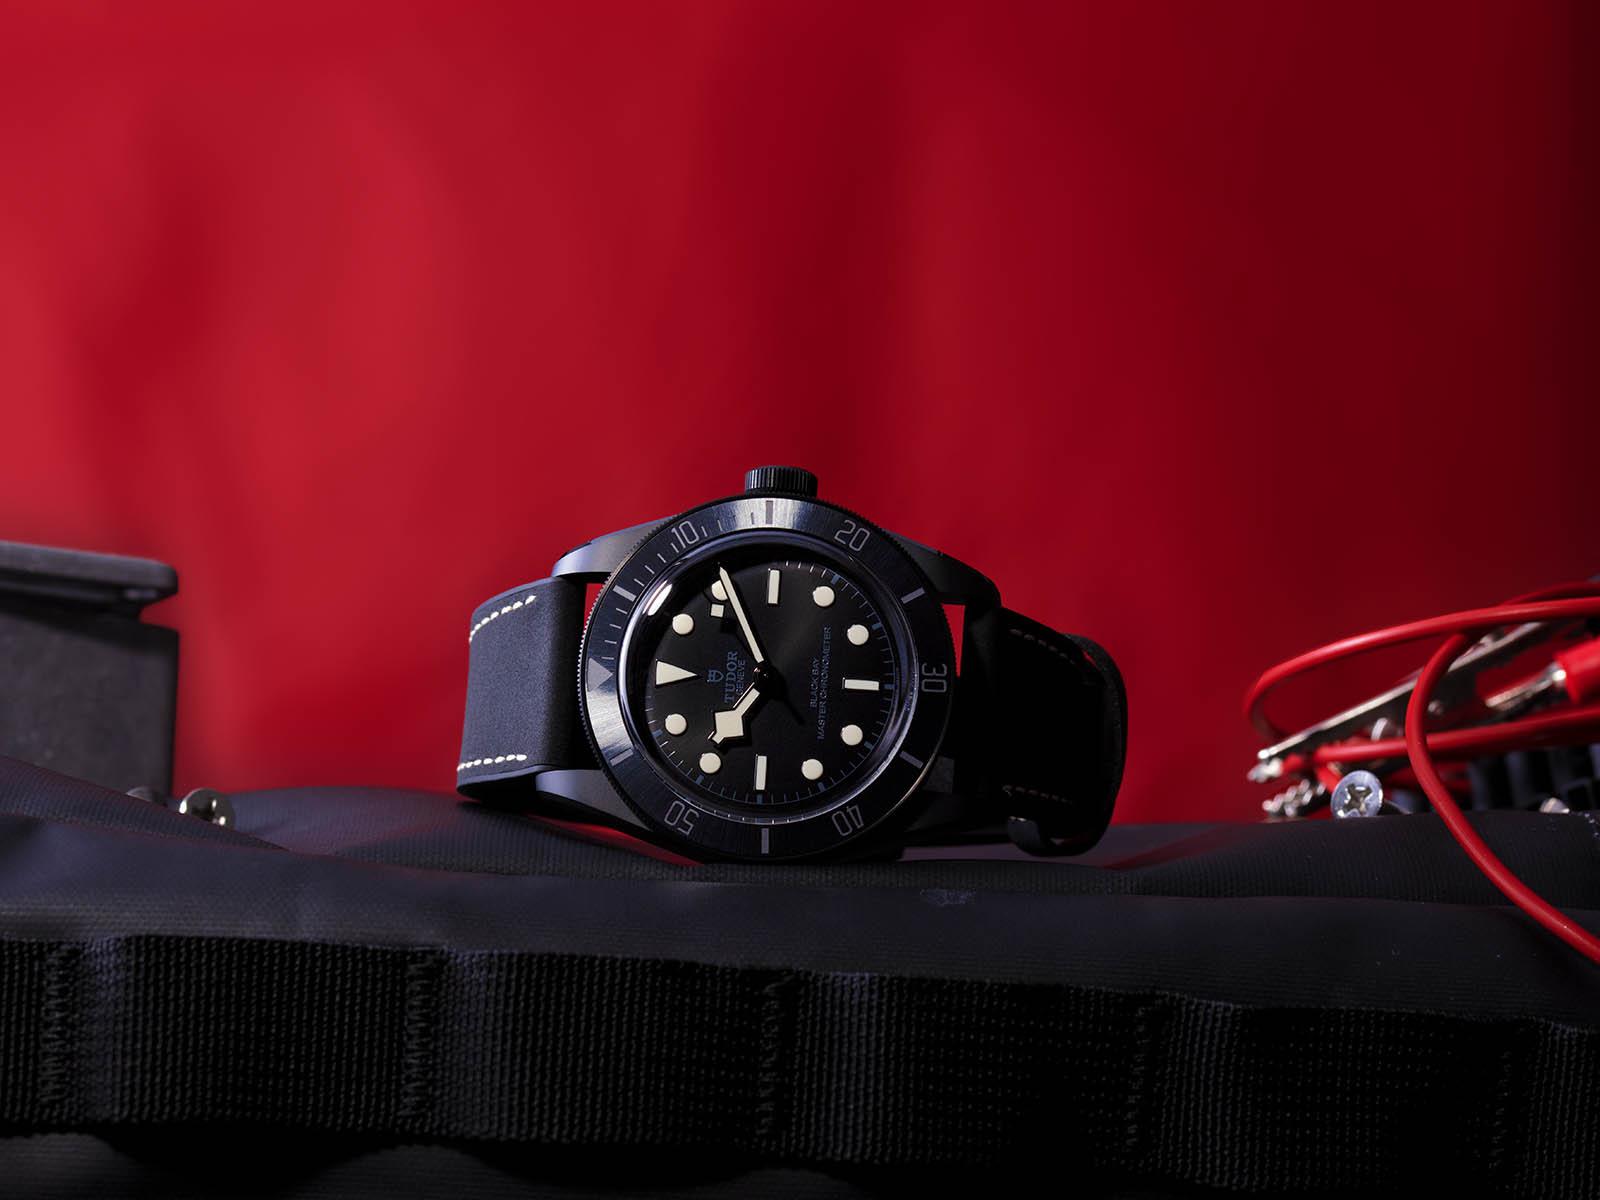 m79210cnu-0001-tudor-black-bay-ceramic-2.jpg